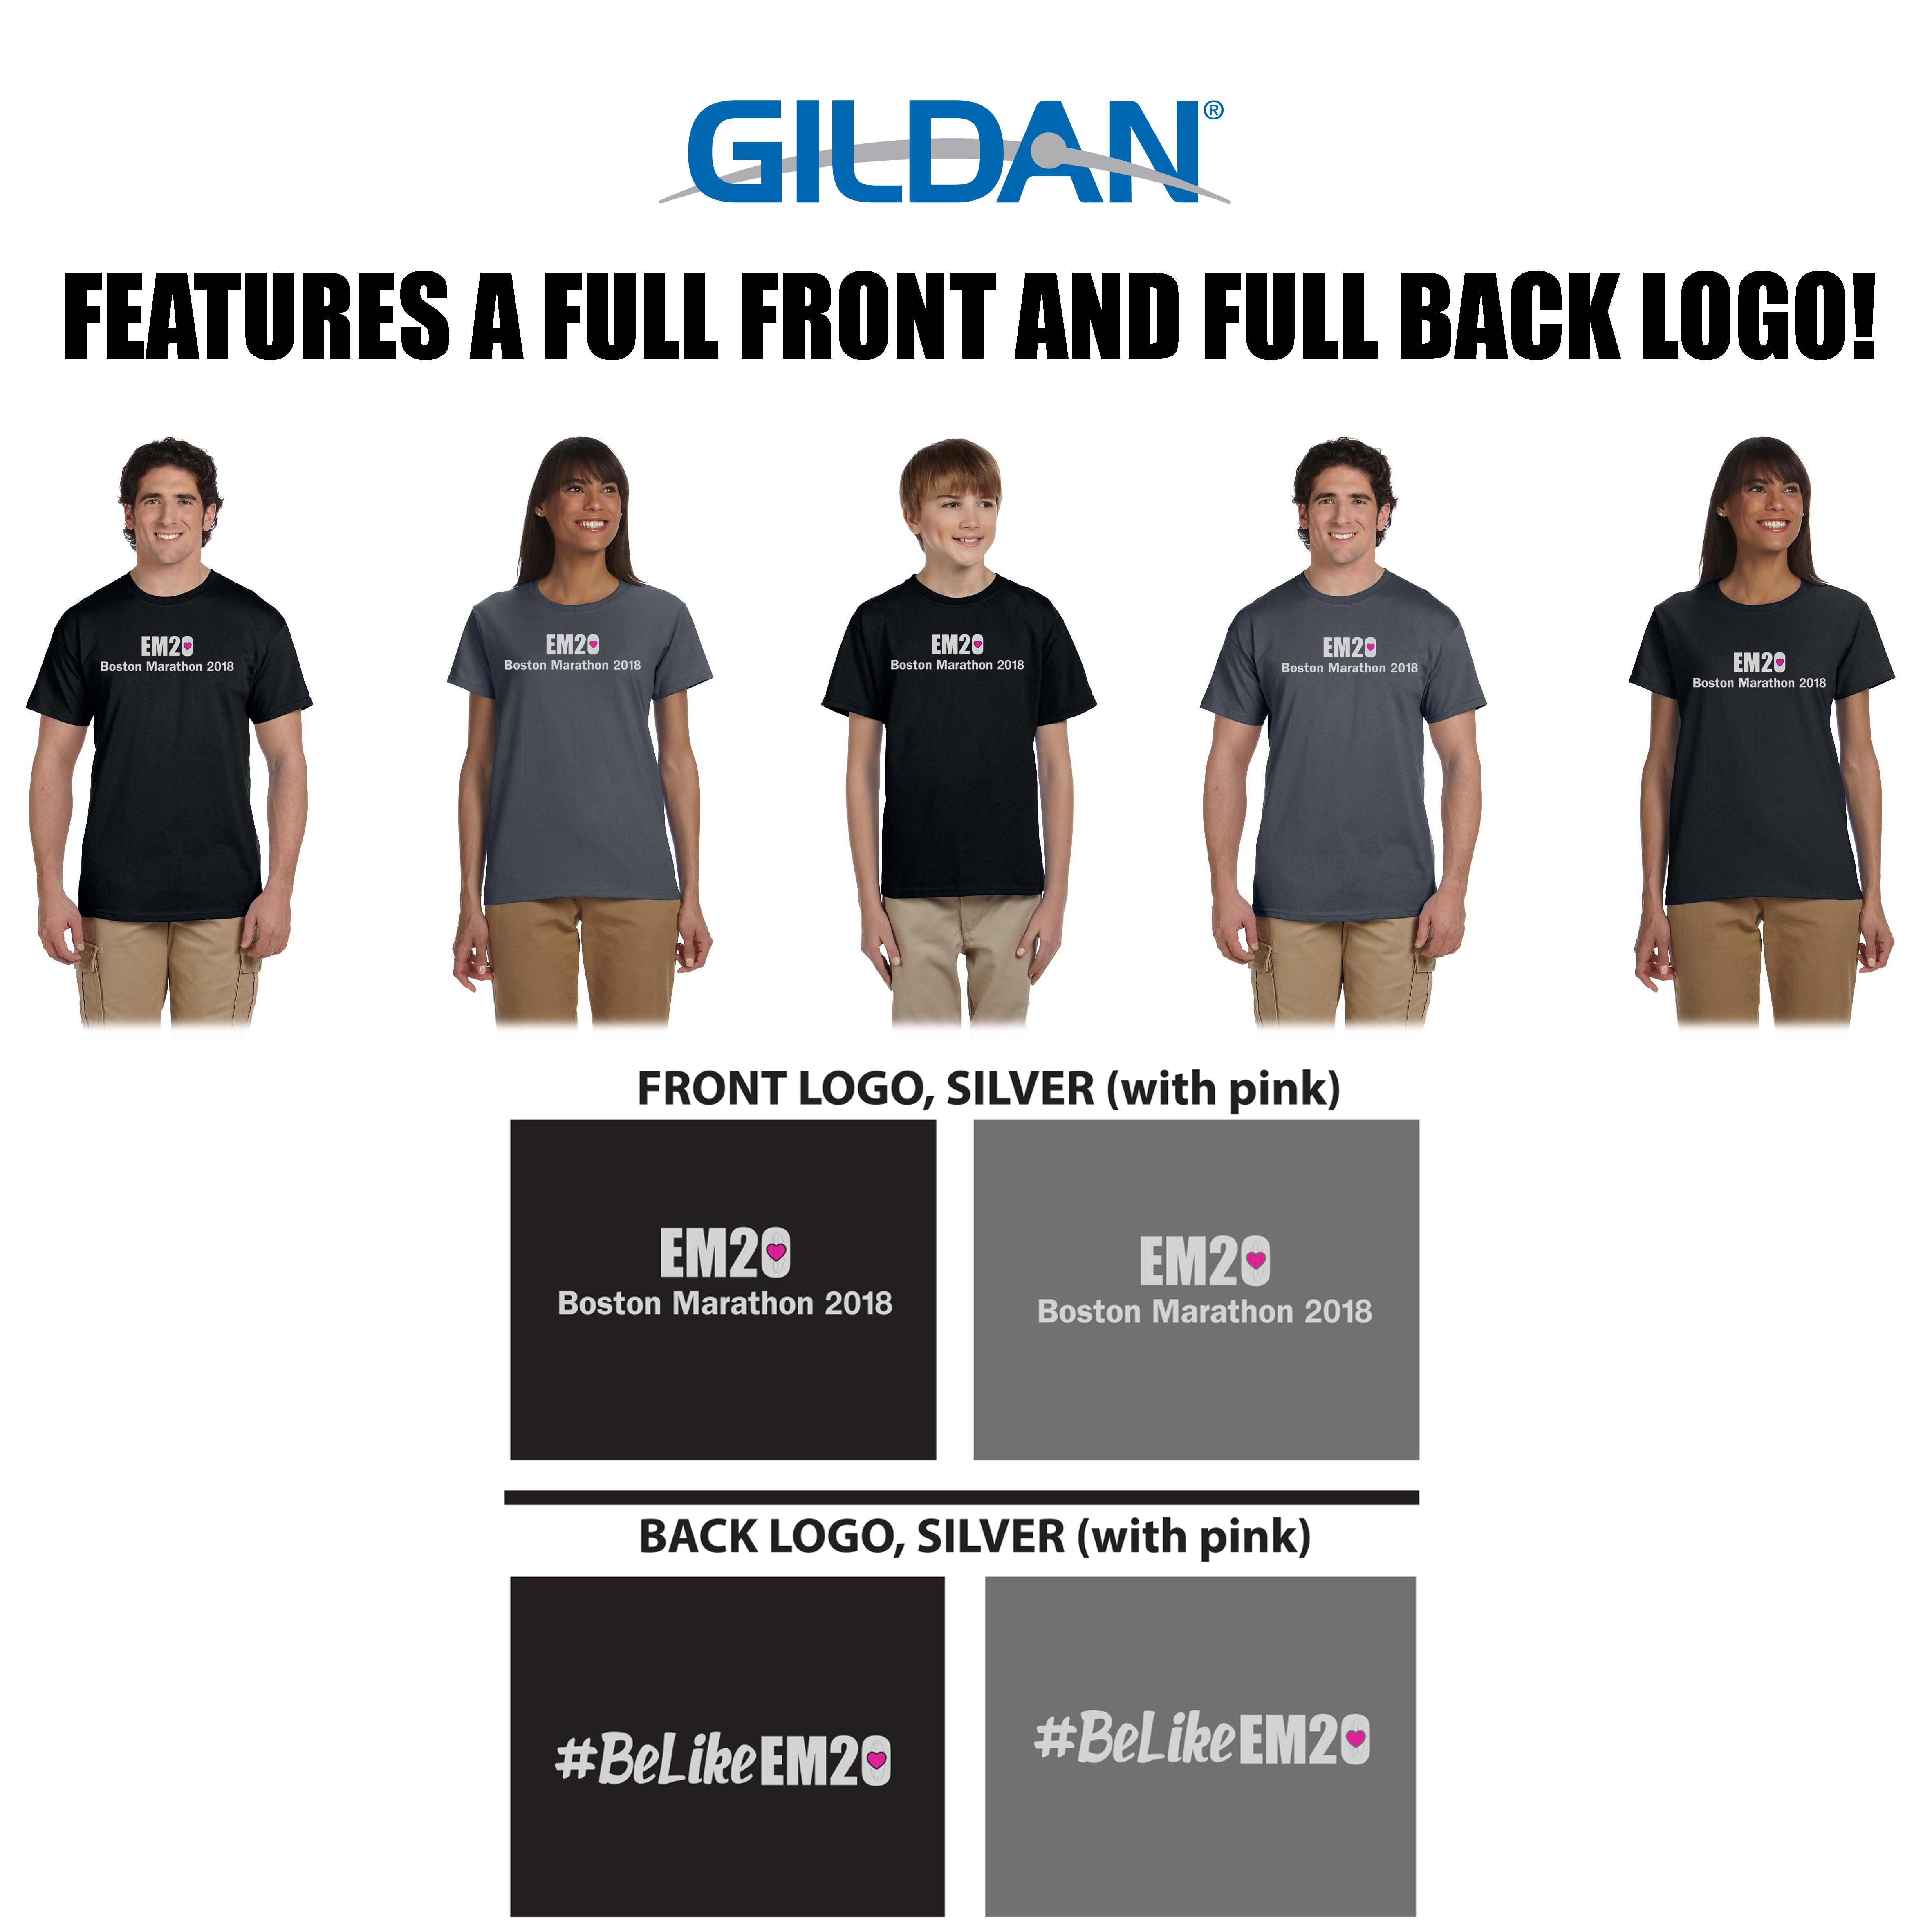 Emma Ryan Scholarship Fund Gildan Ultra Cotton® 6 oz. T-Shirt, Youth, Men's & Women's Fit, SILVER LOGO SPECIAL EDITION BOSTON MARATHON 2018